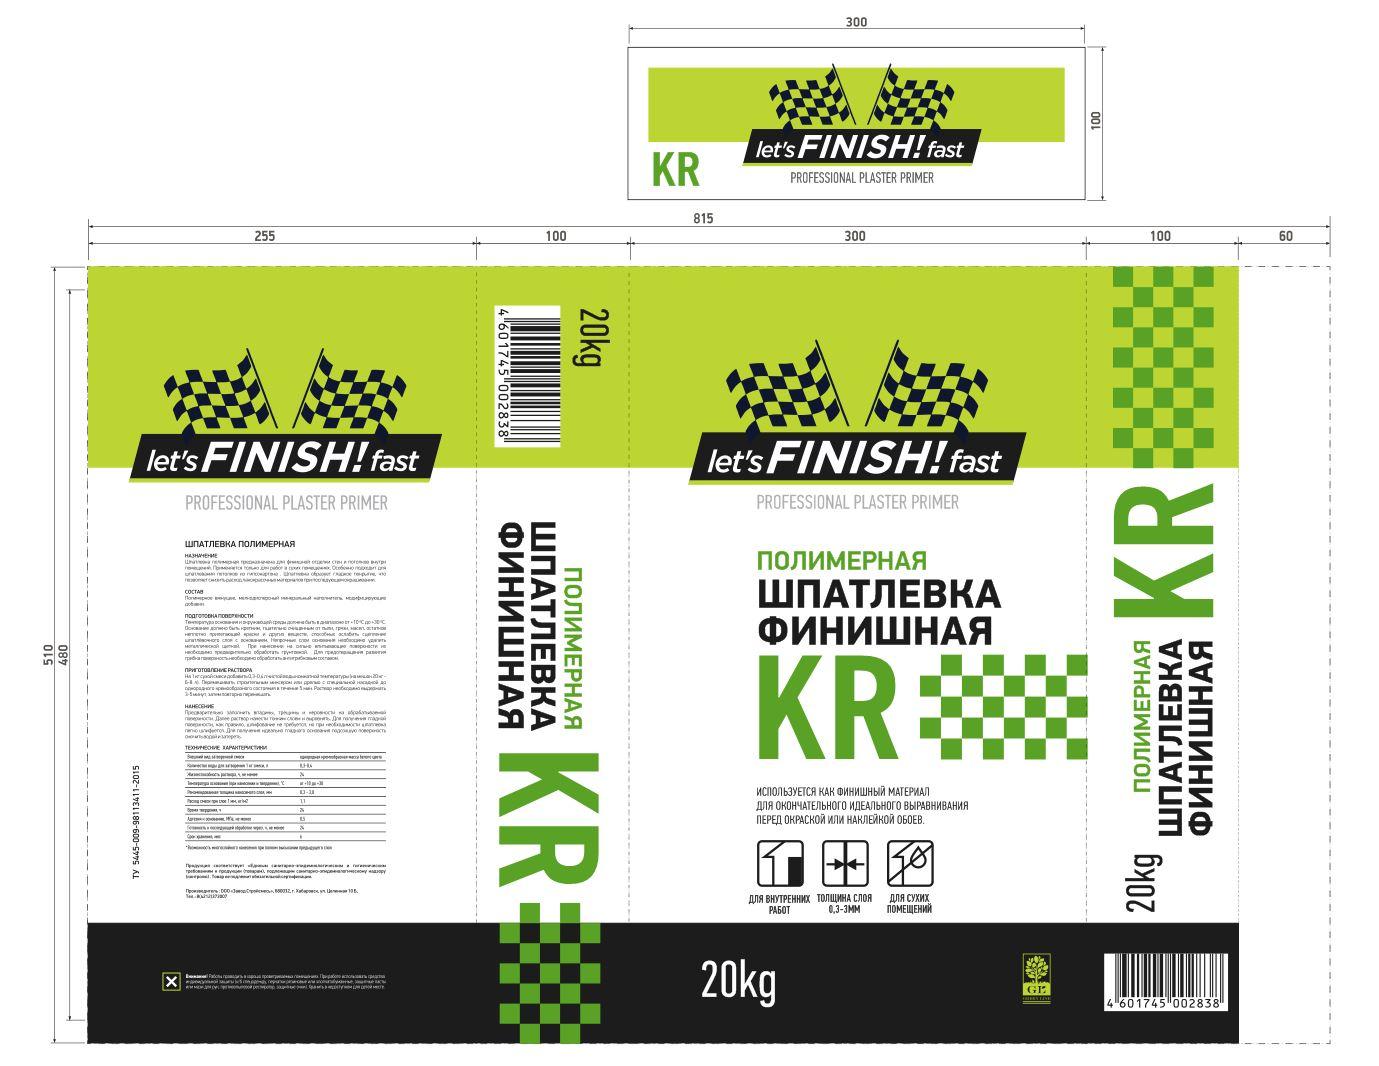 Разработка дизайна упаковки для линейки строит. шпатлевок фото f_2575901f828404b2.jpg